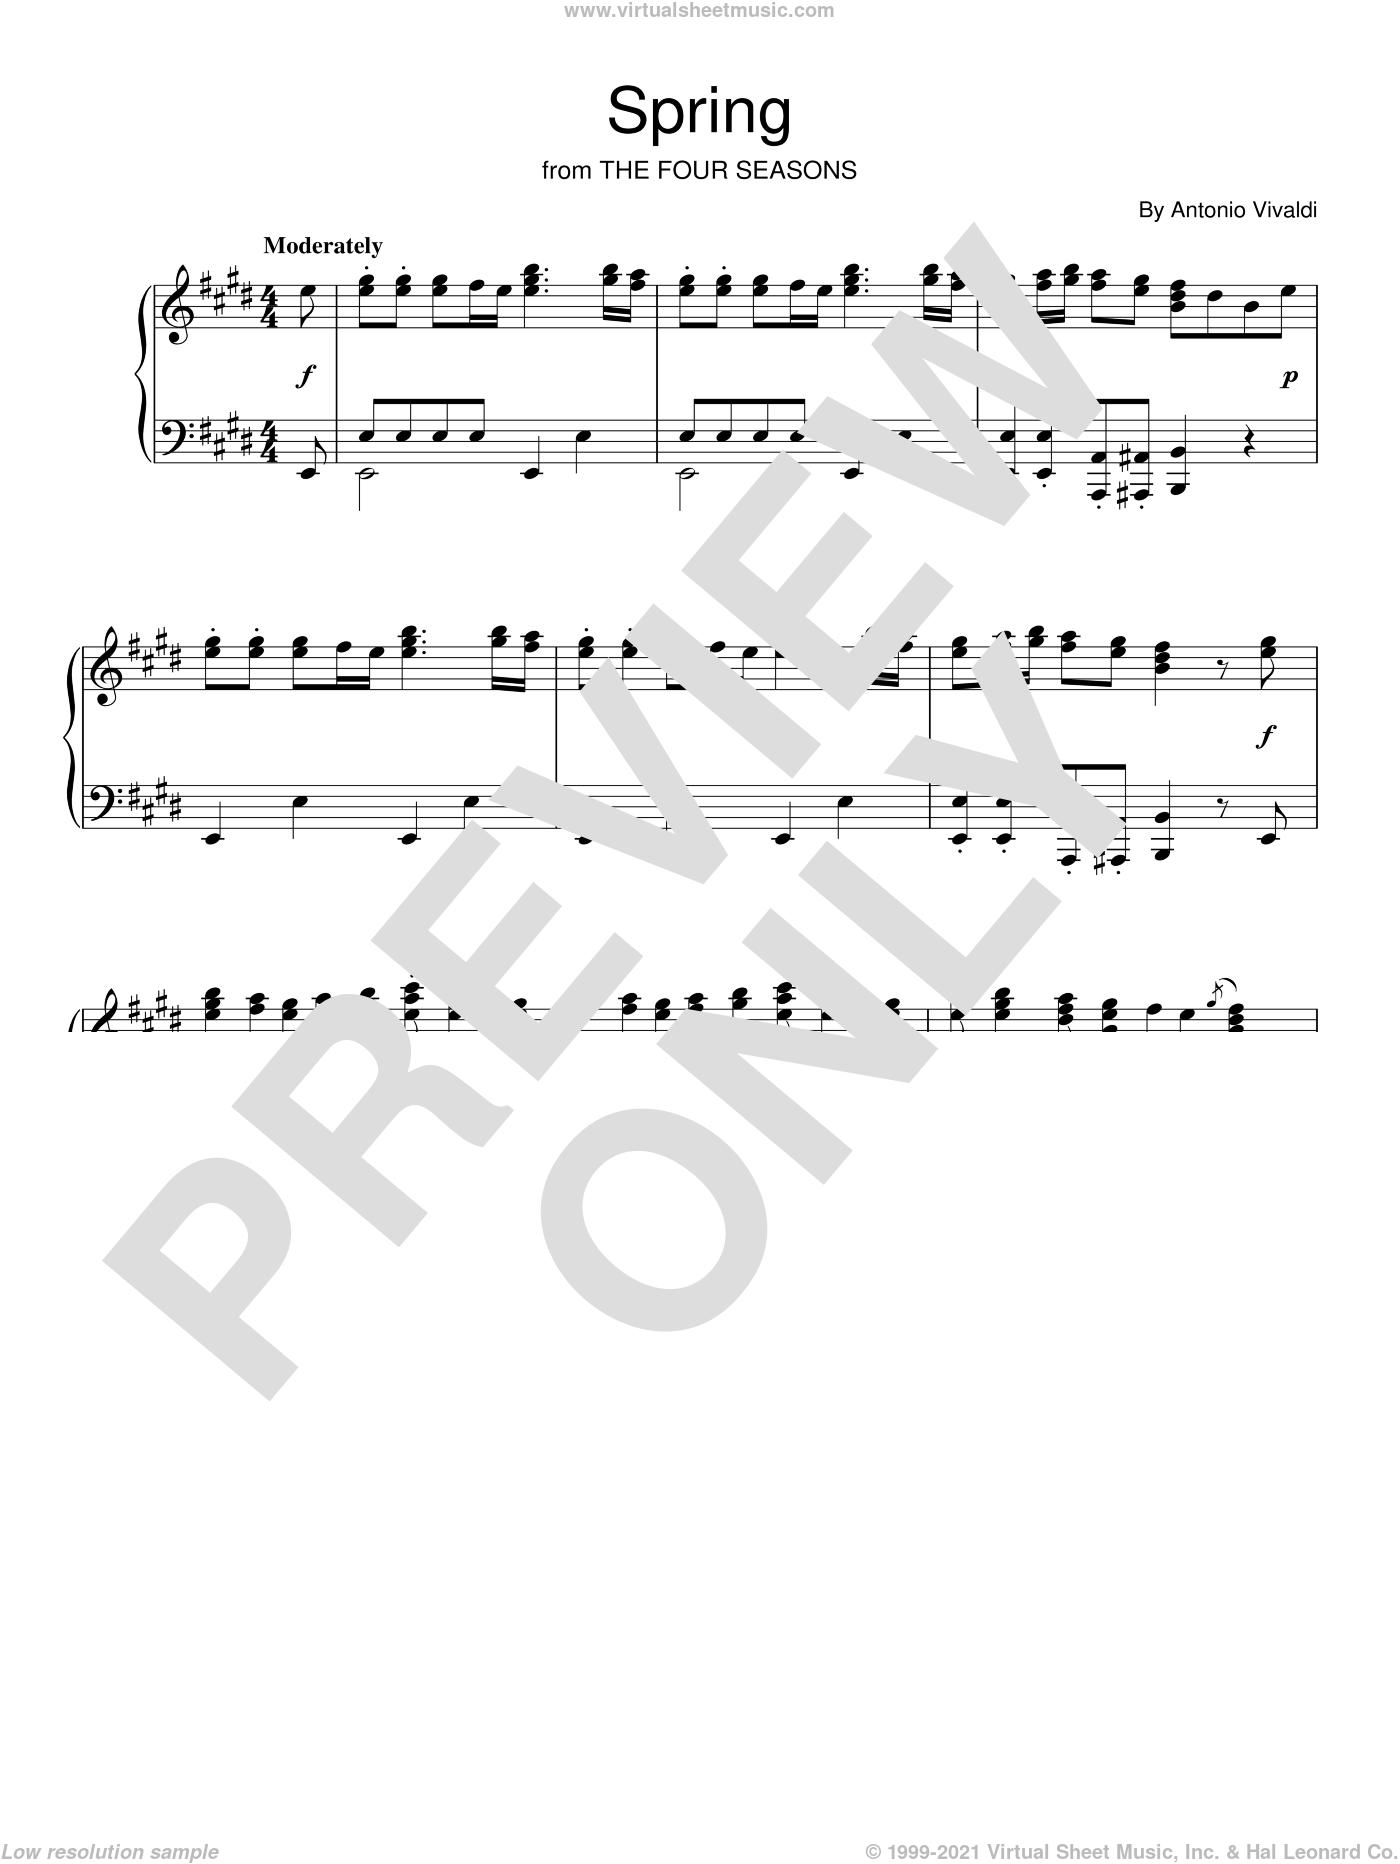 Spring (from The Four Seasons) sheet music for piano solo by Antonio Vivaldi, classical score, intermediate skill level